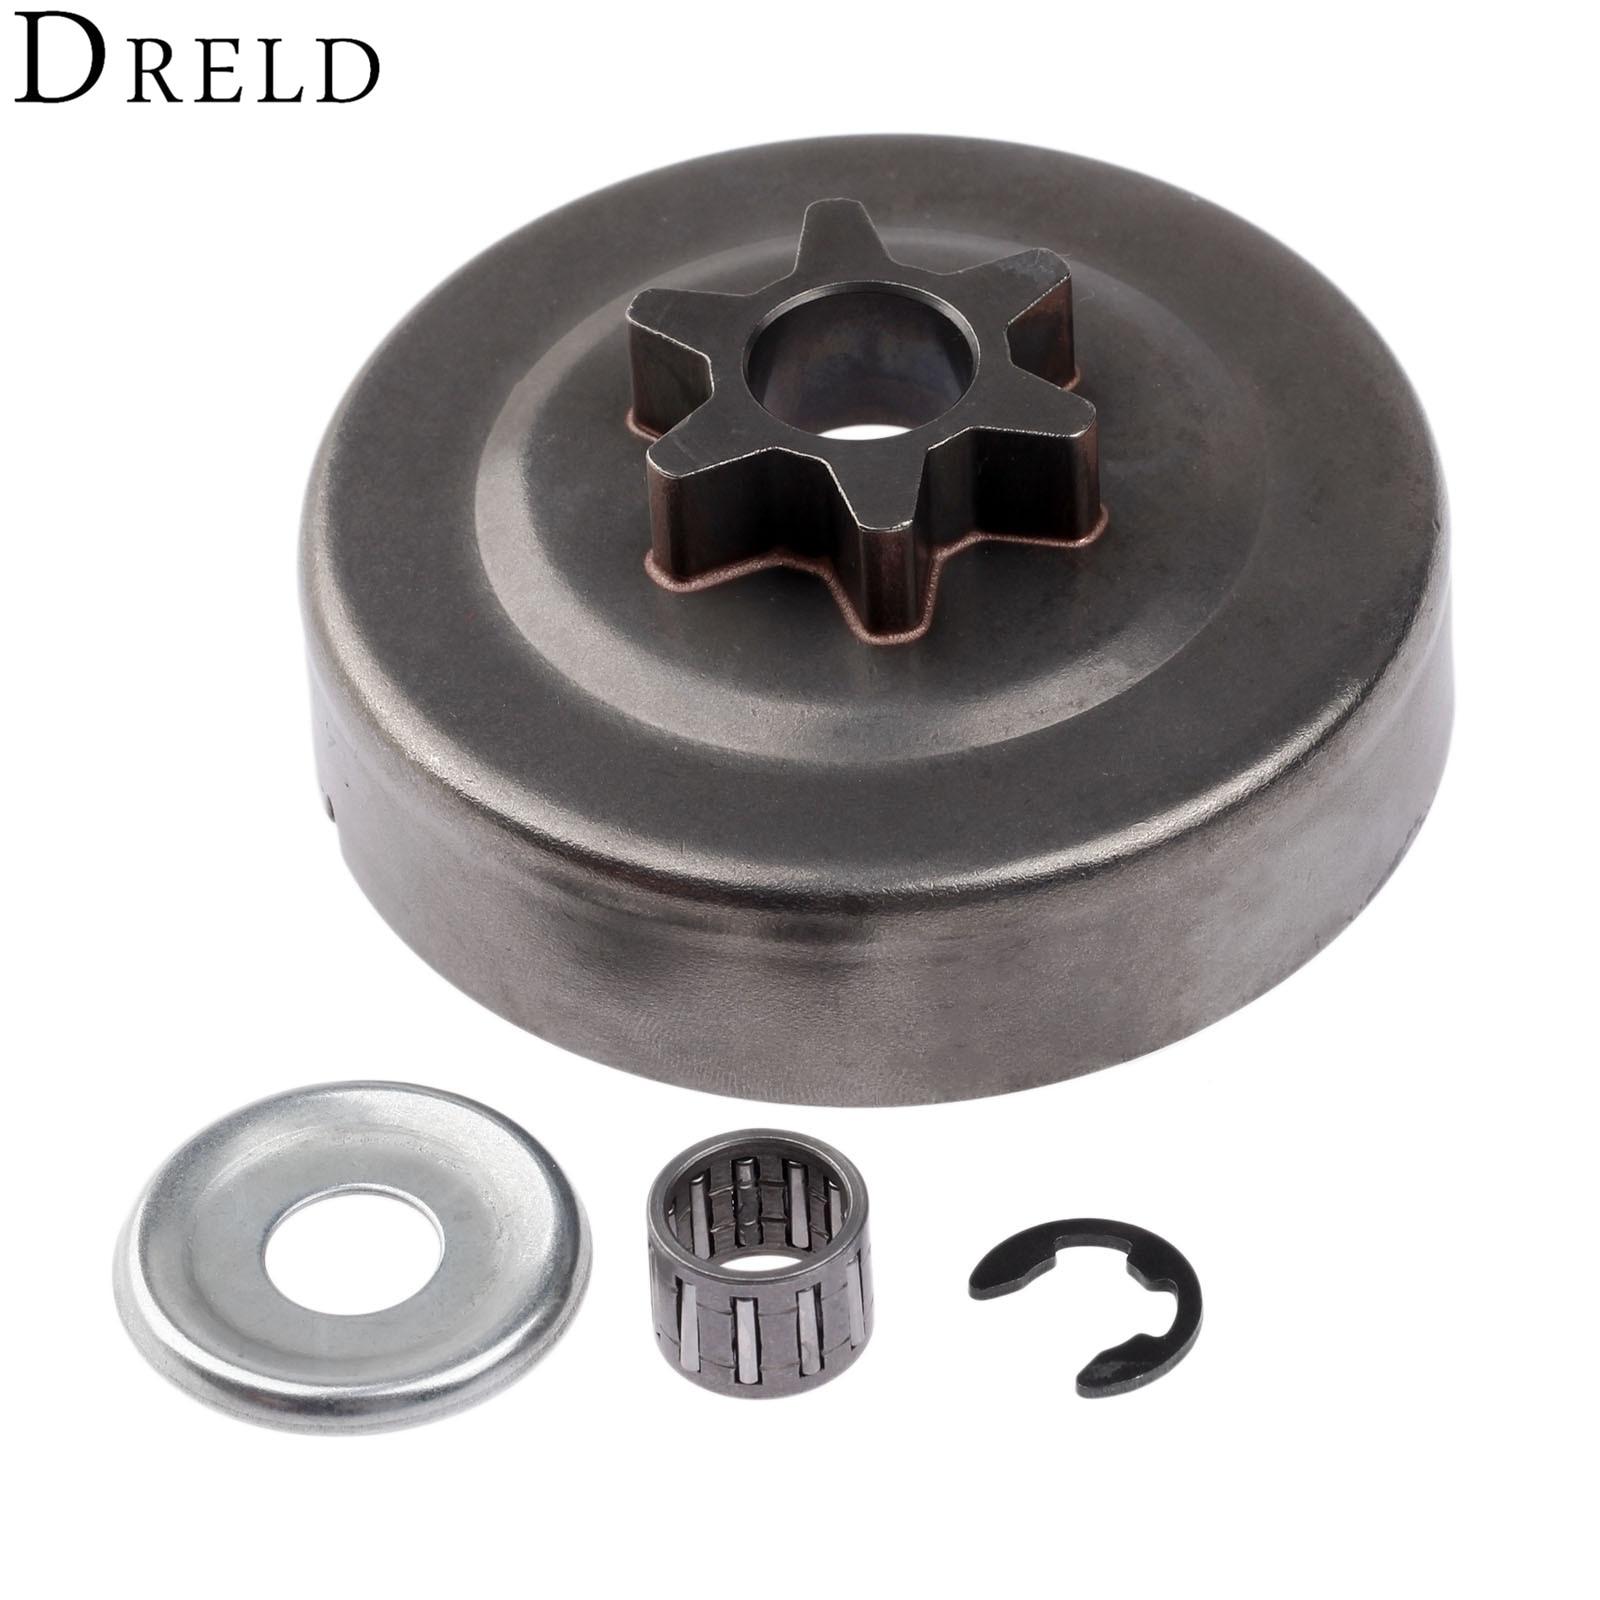 DRELD 3/8 6 t Kupplung Trommel Kettenrad Washer E-Clip Kit Für STIHL Kettensäge 017 018 021 023 025 MS170 MS180 MS210 MS230 MS250 1123